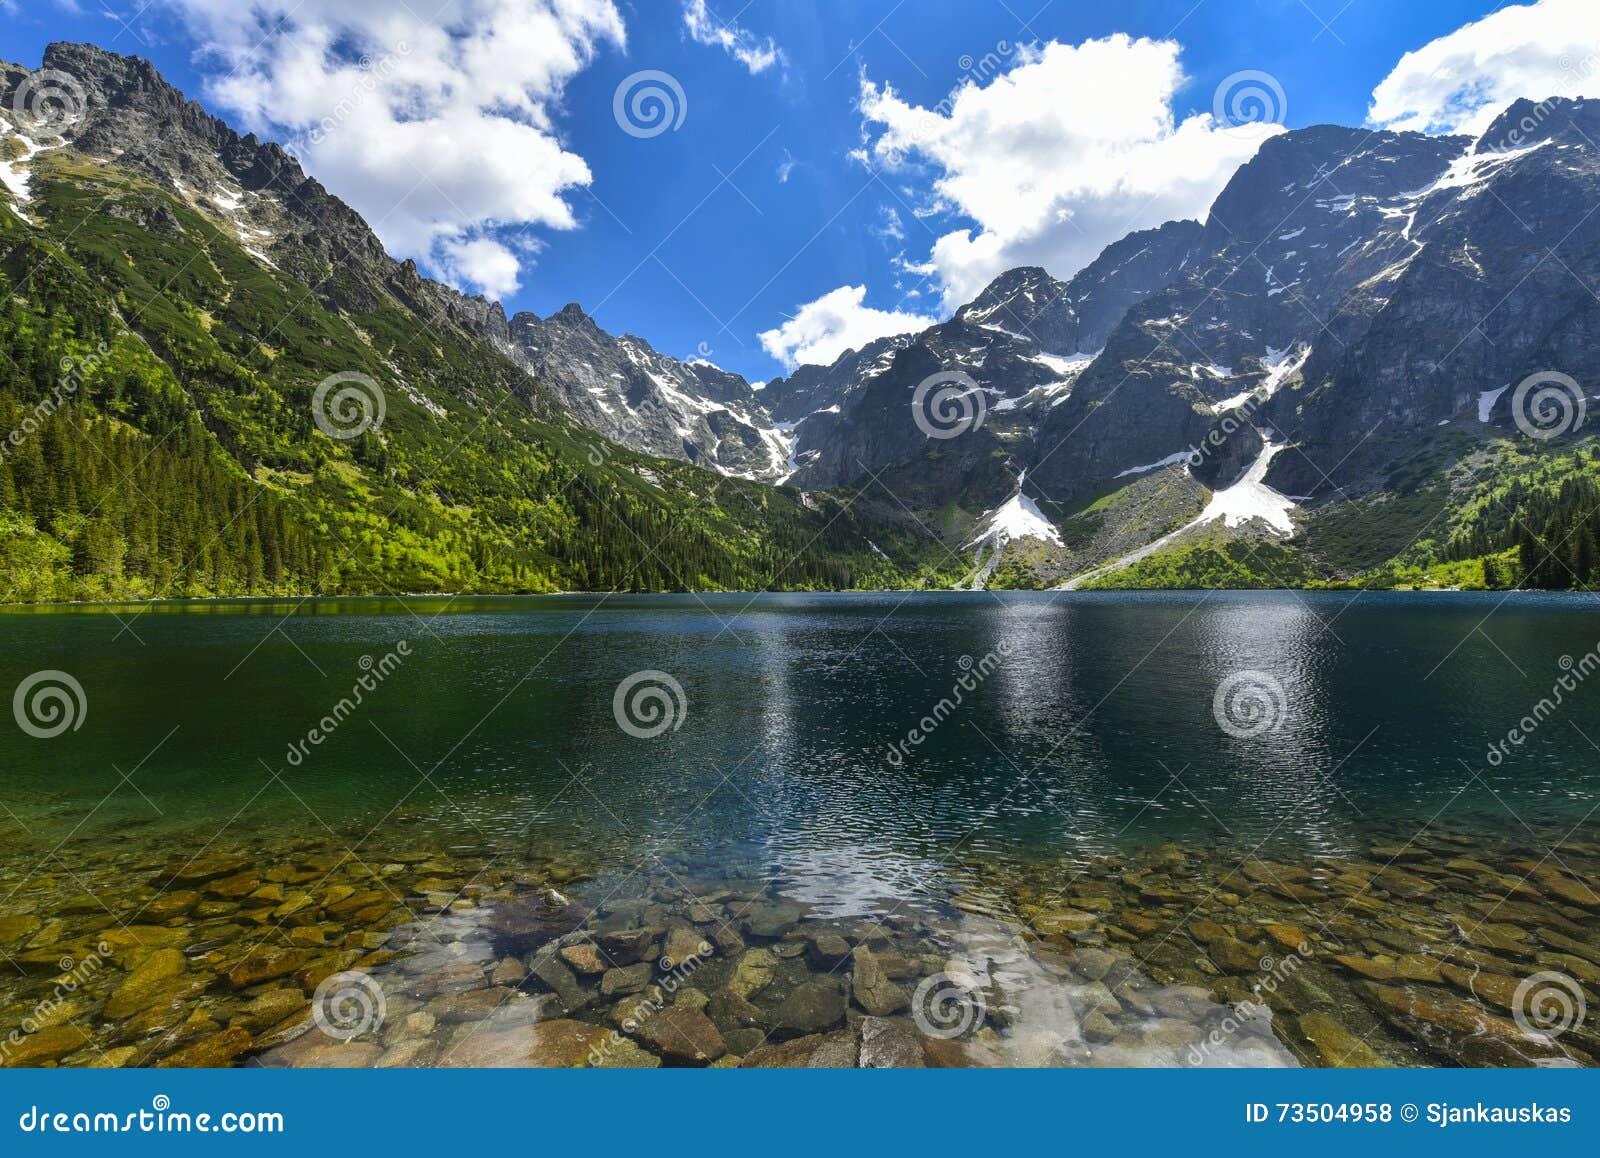 Morskie oko lake, Sea eye, Zakopane, Poland